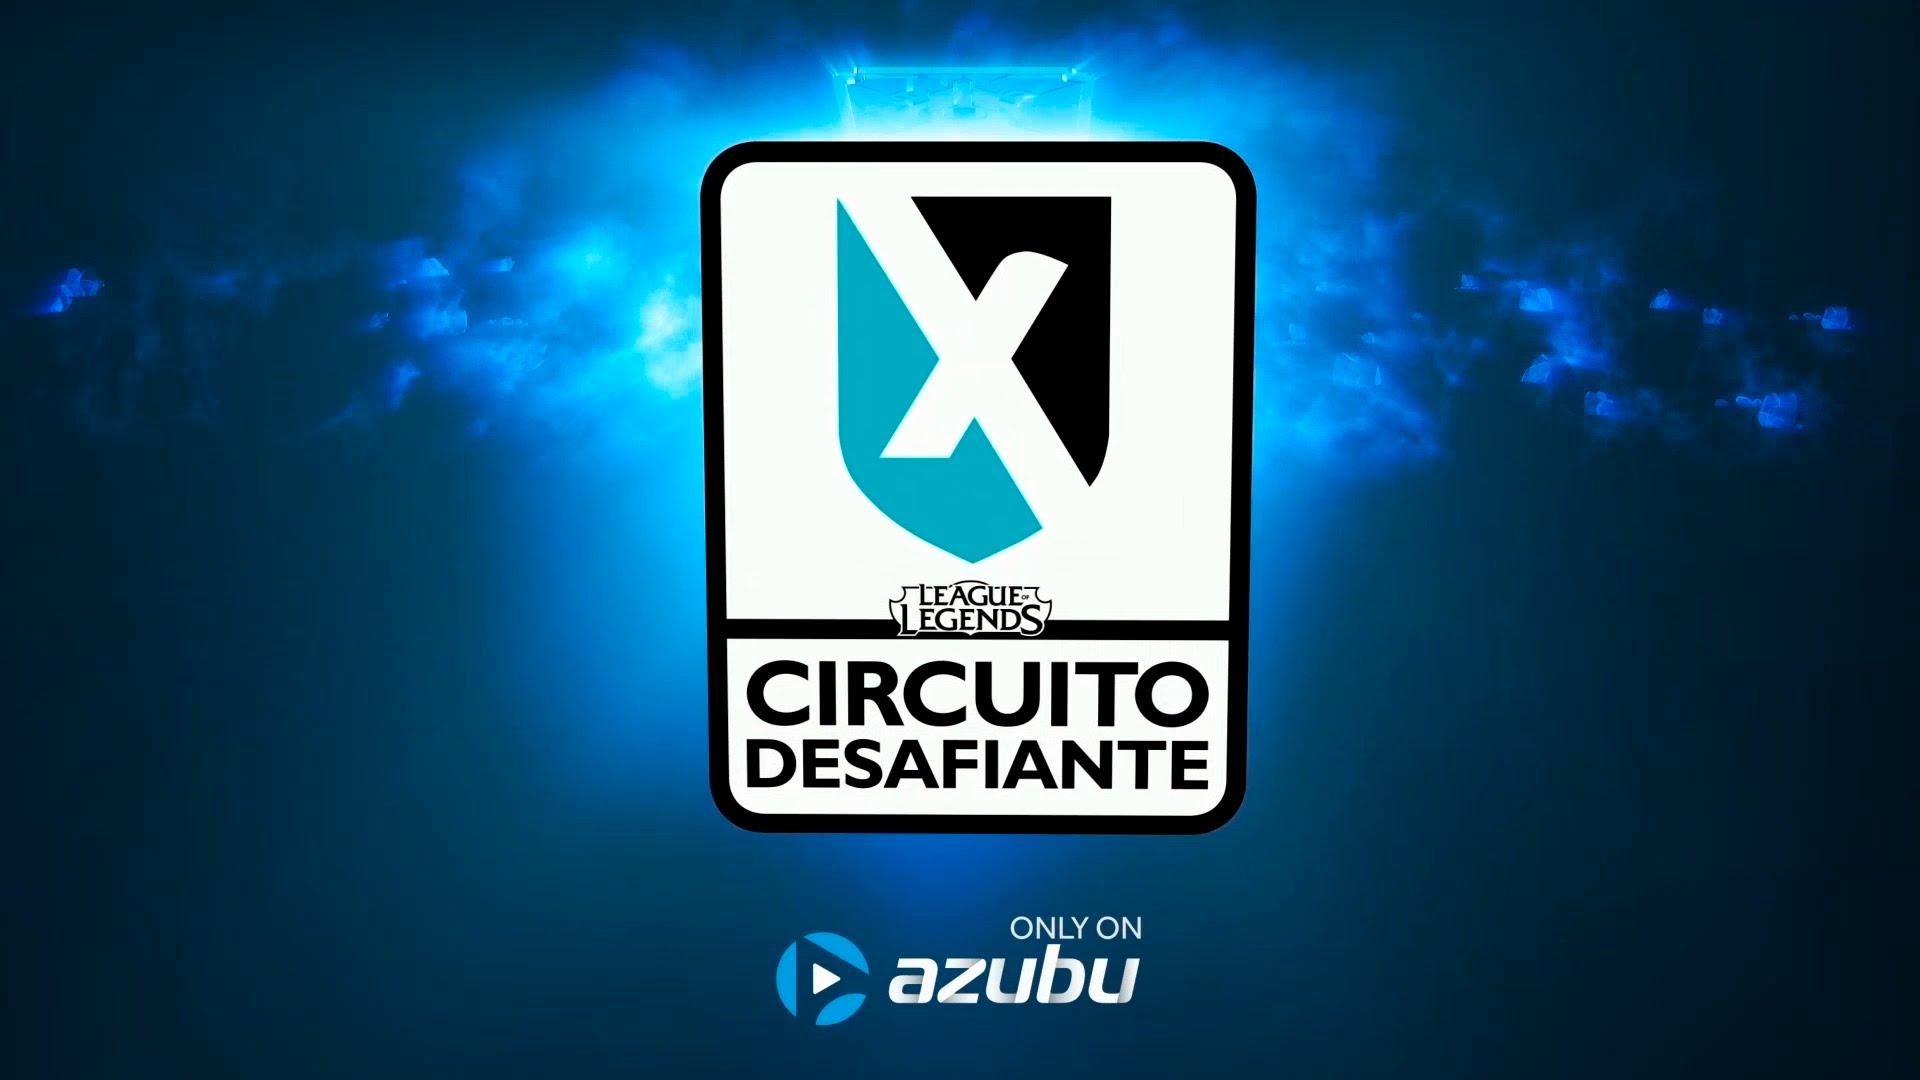 League of Legends - Circuito Desafiante 2016 - Banner Logo Azubu